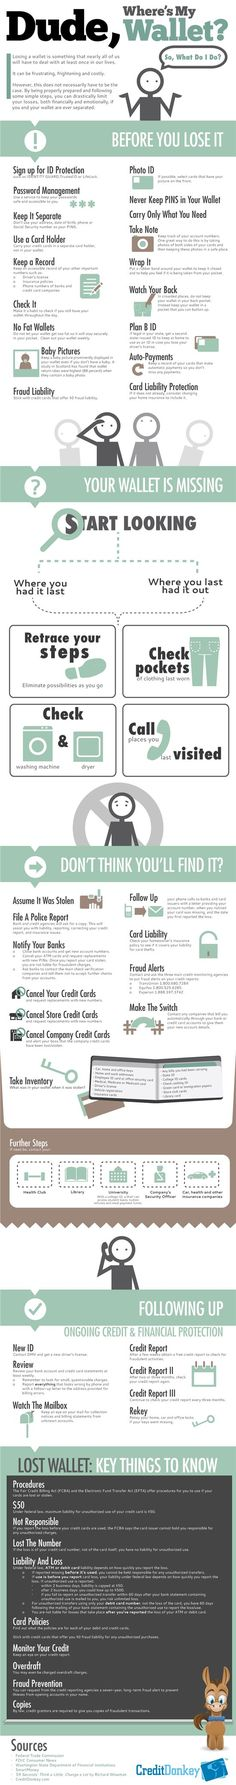 Infographics: Lost Wallet © CreditDonkey